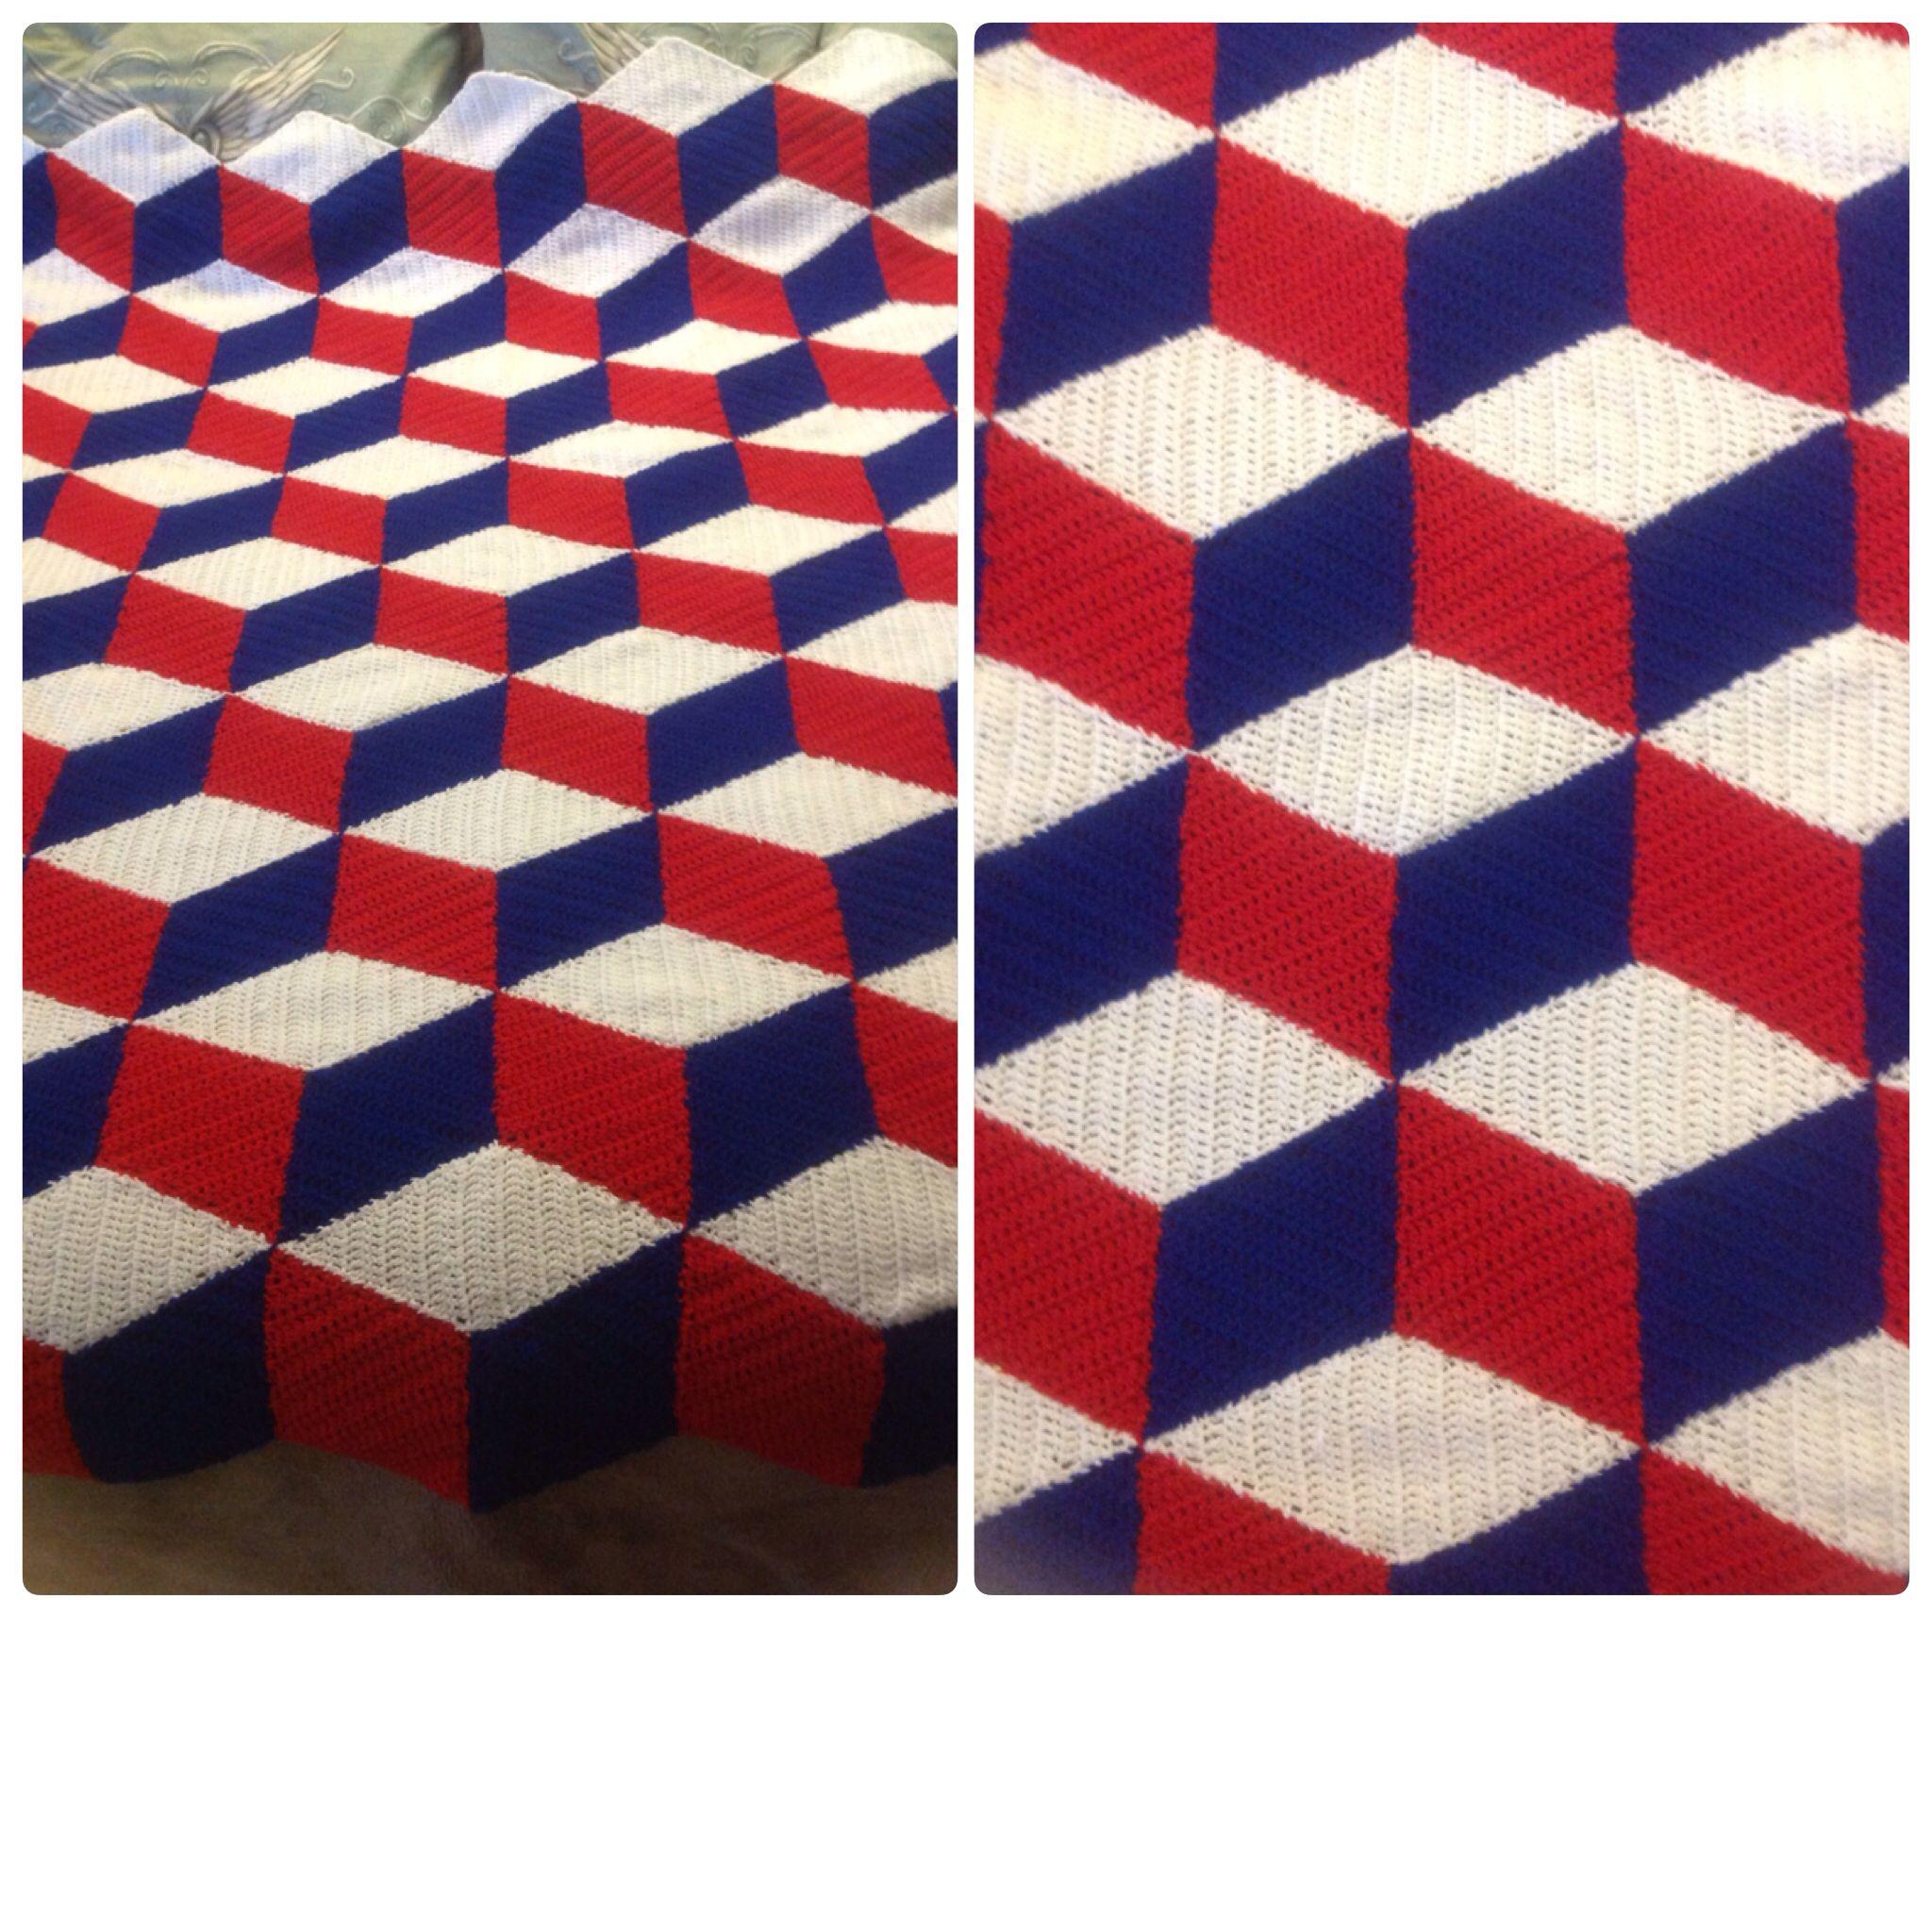 3d Optical Illusion Crochet Afghan Blanket Tumbling Blocks